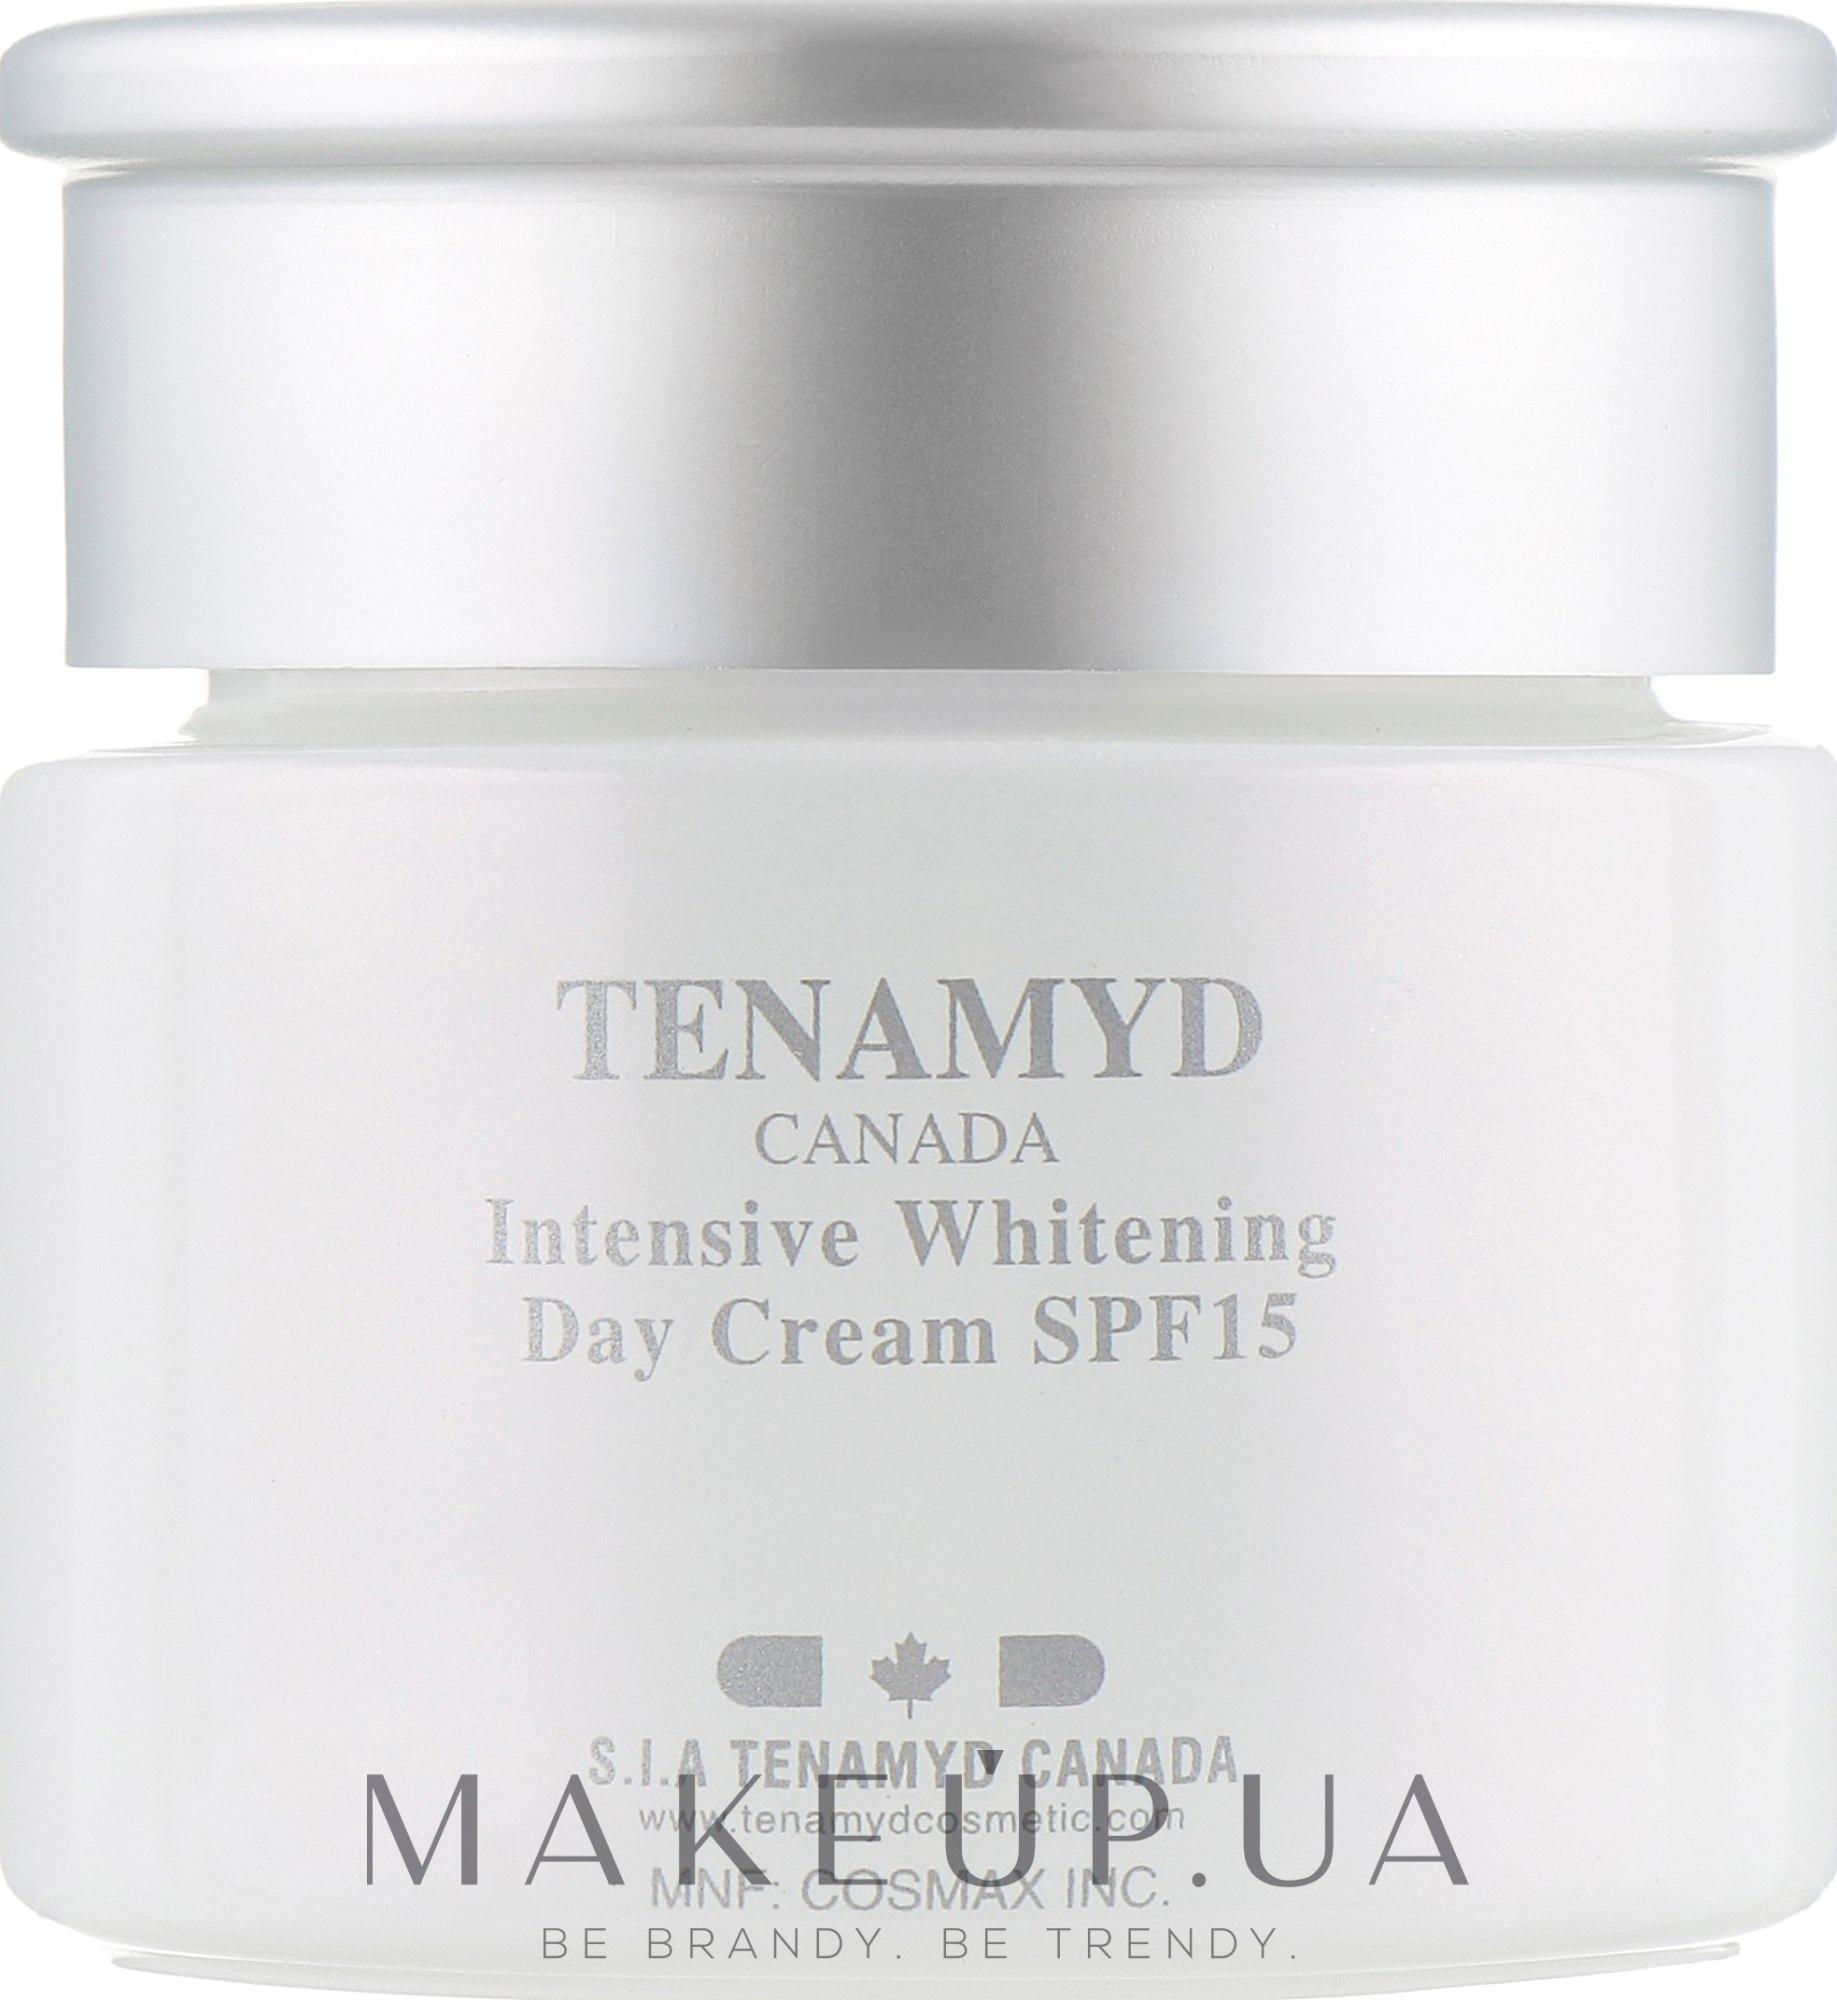 Интенсивно отбеливающий дневной крем с SPF15 для кожи с пигментацией - Tenamyd Canada White Lagoon Intensive Whitening Day Cream SPF15 — фото 60ml